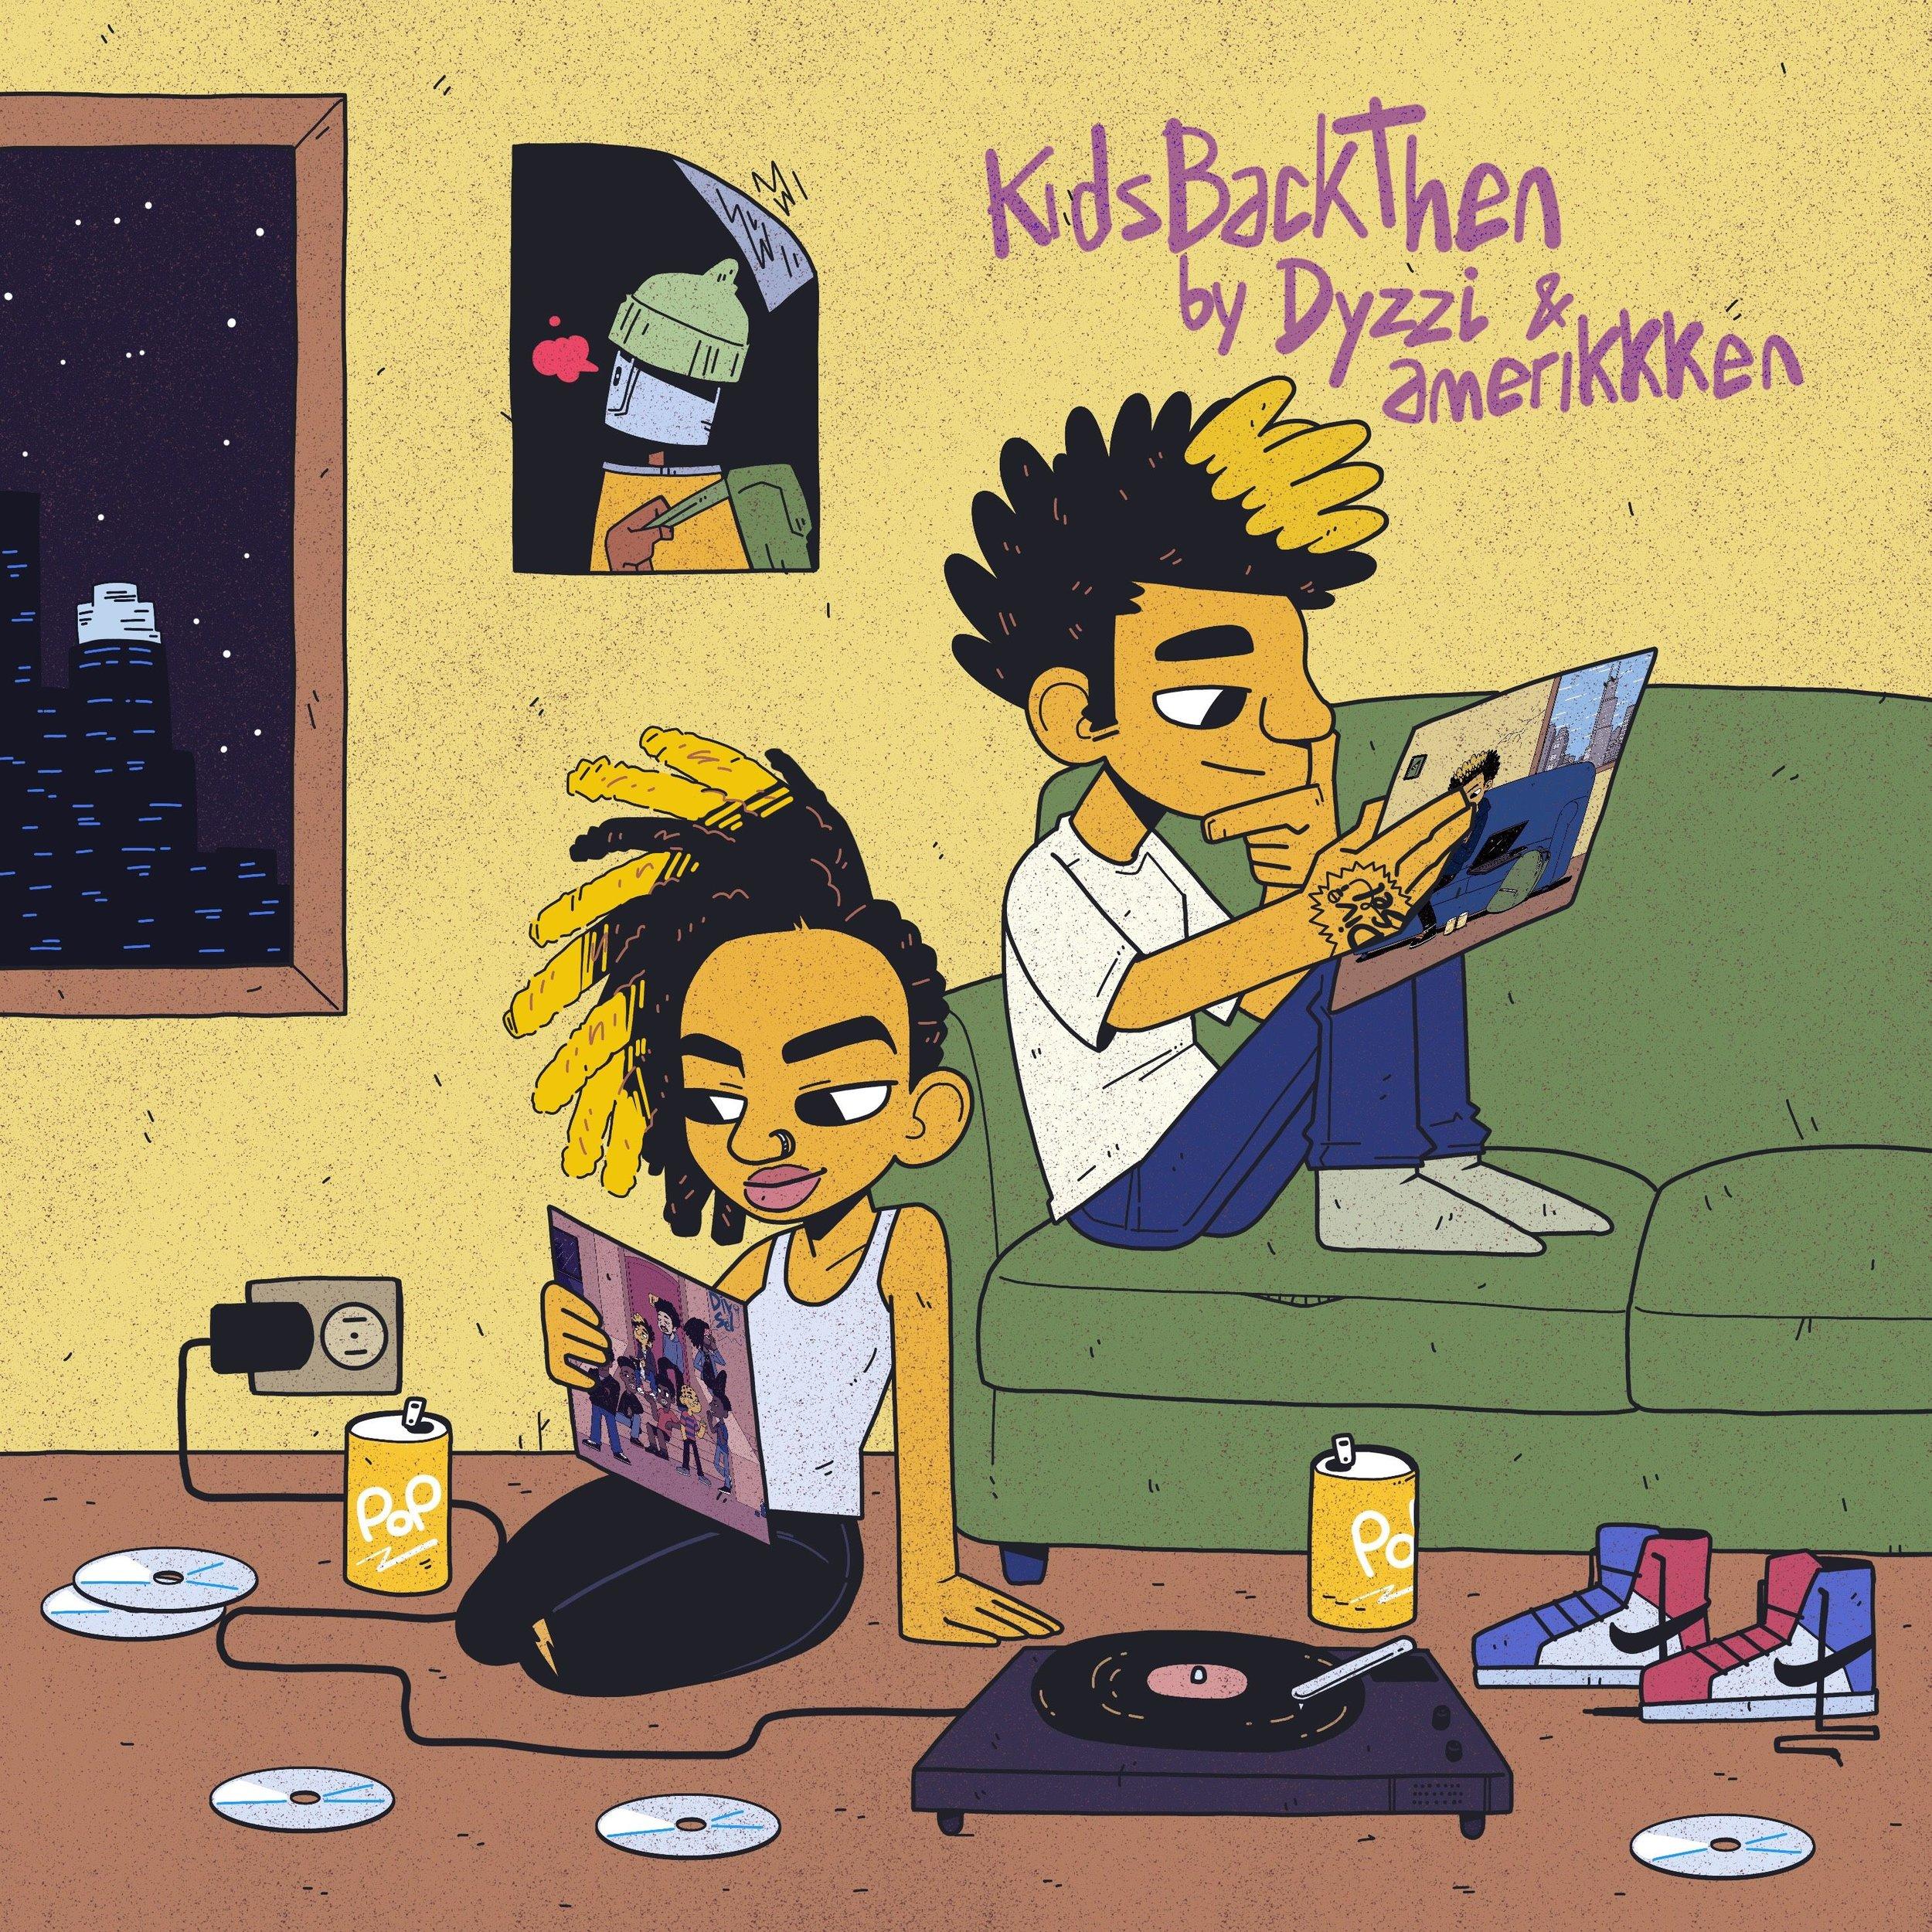 kidsbackthen.jpg